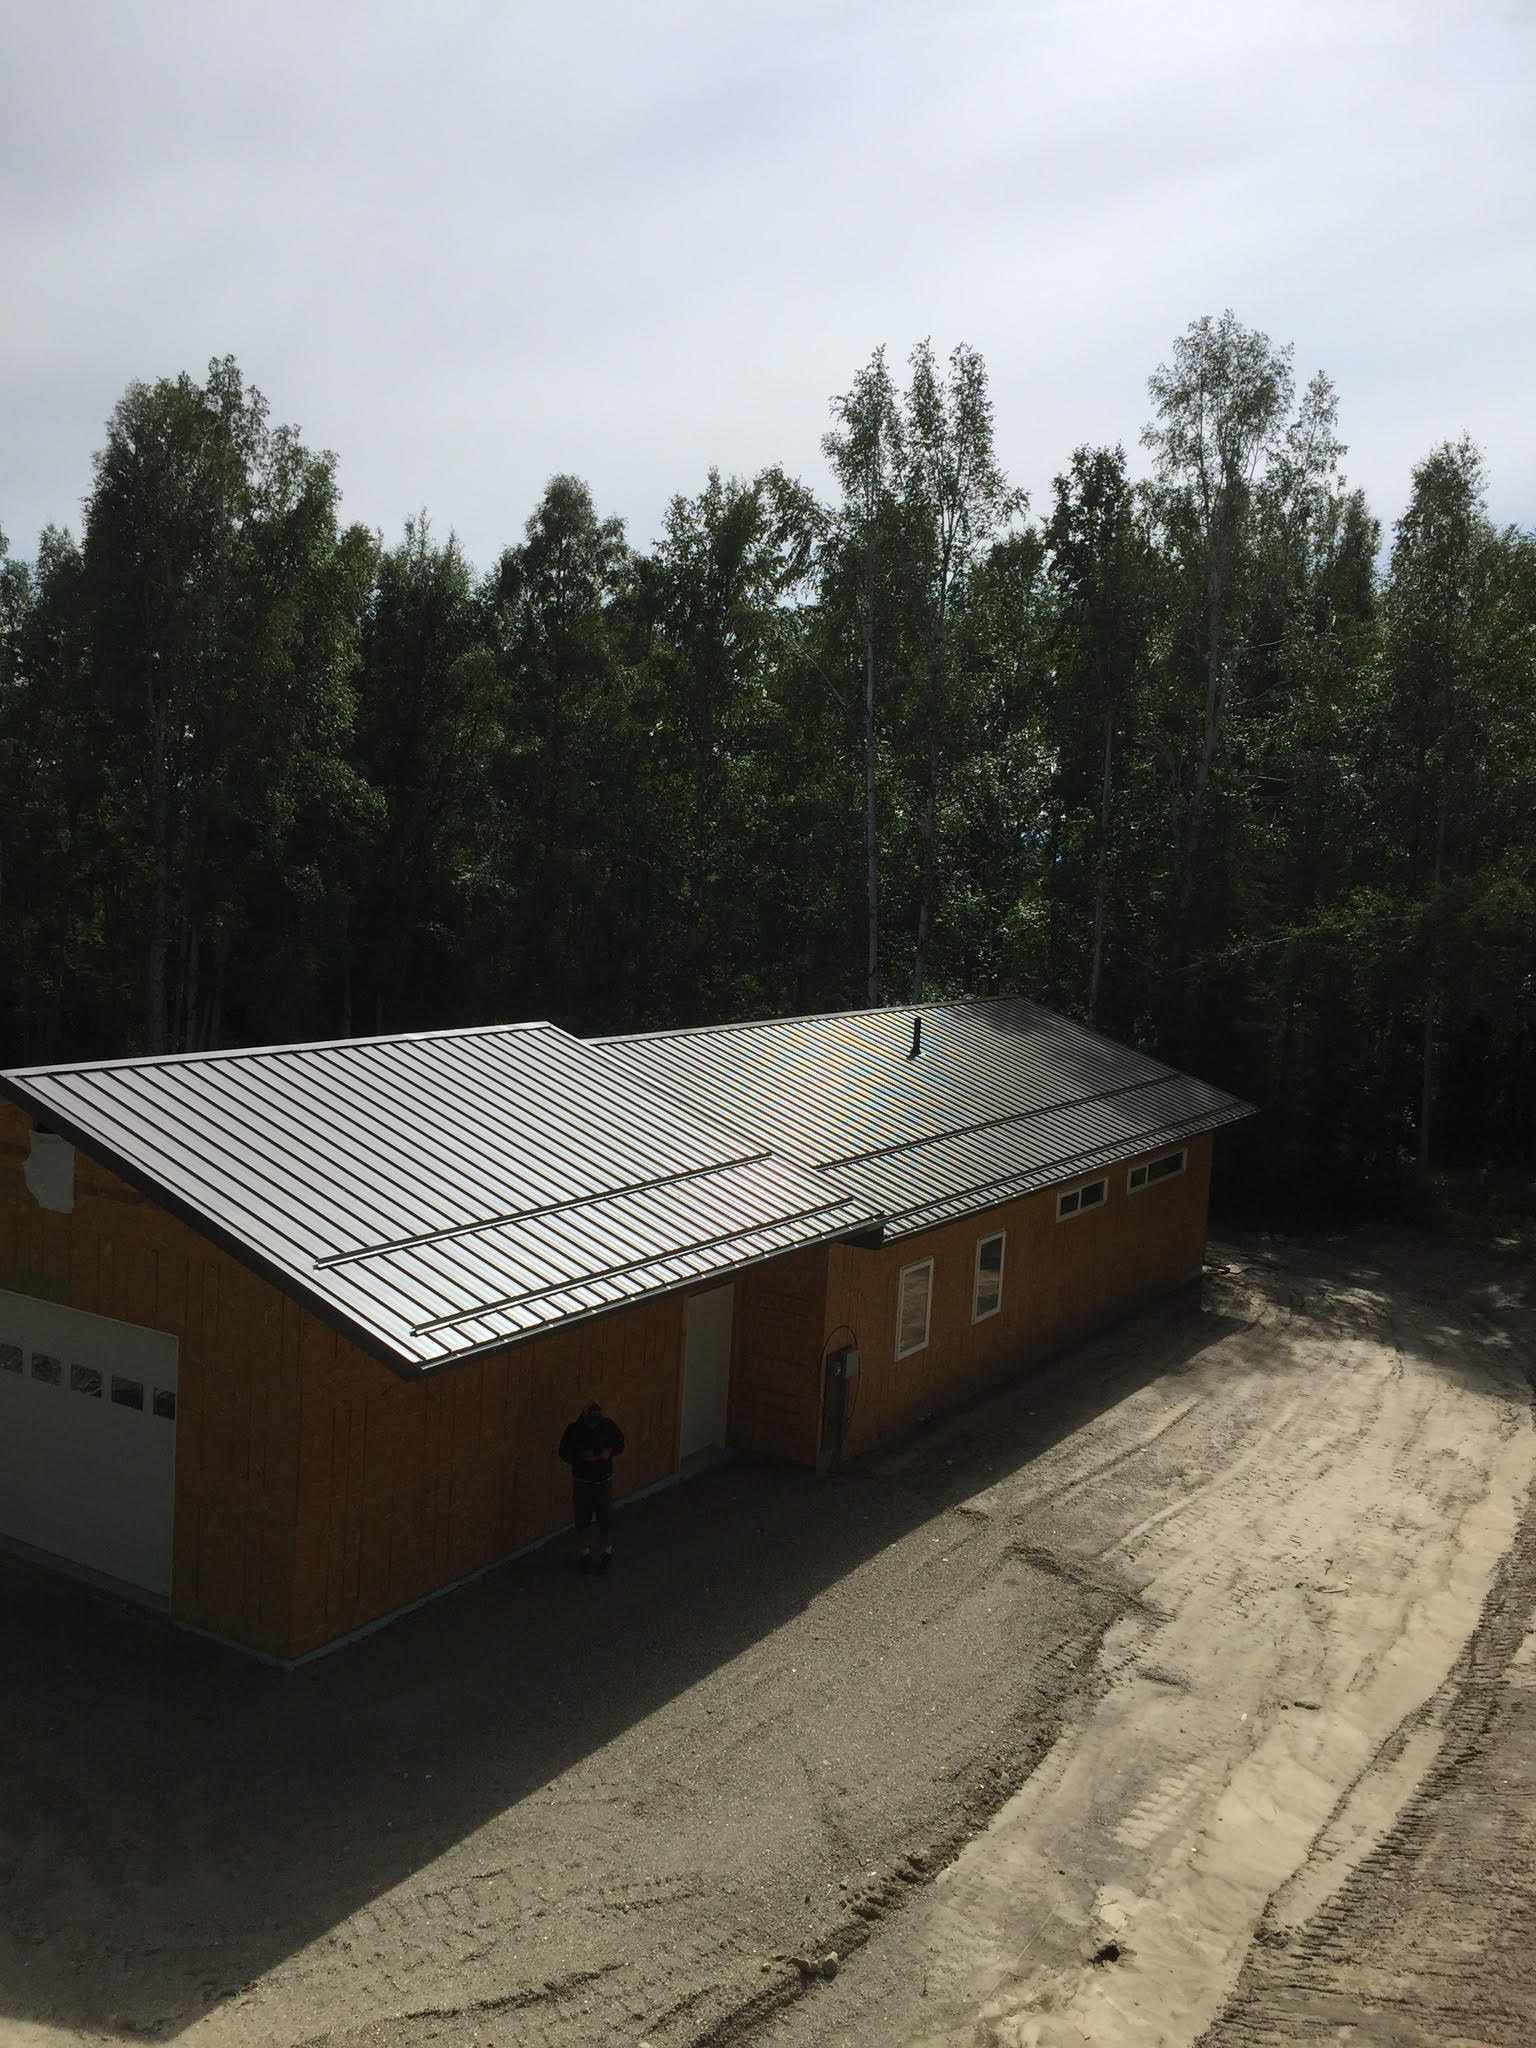 Roofing Contractor Siding Contractor Fairbanks Alaska